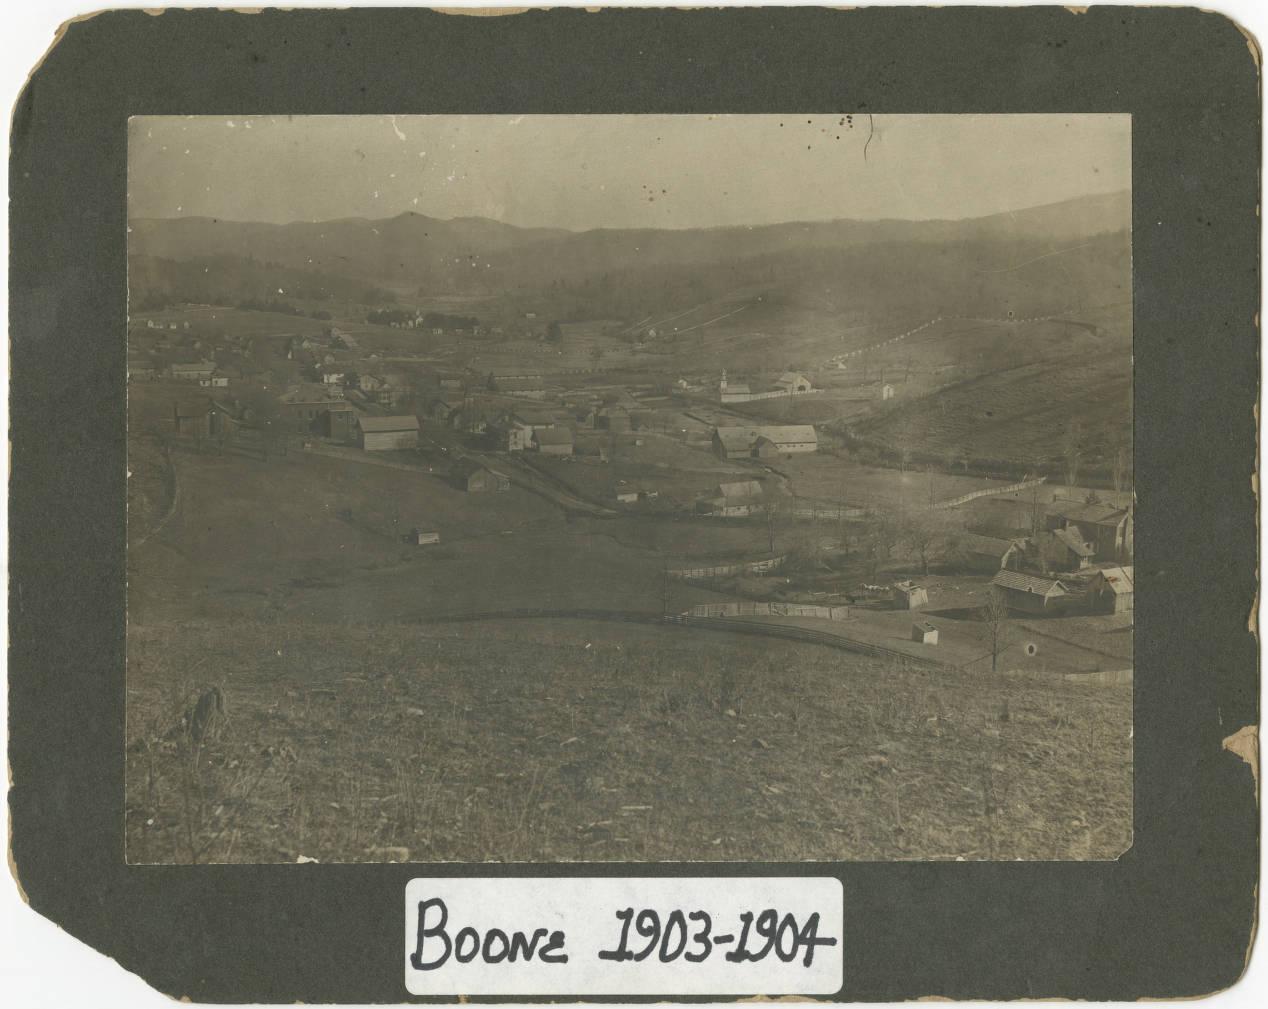 Boone 1905